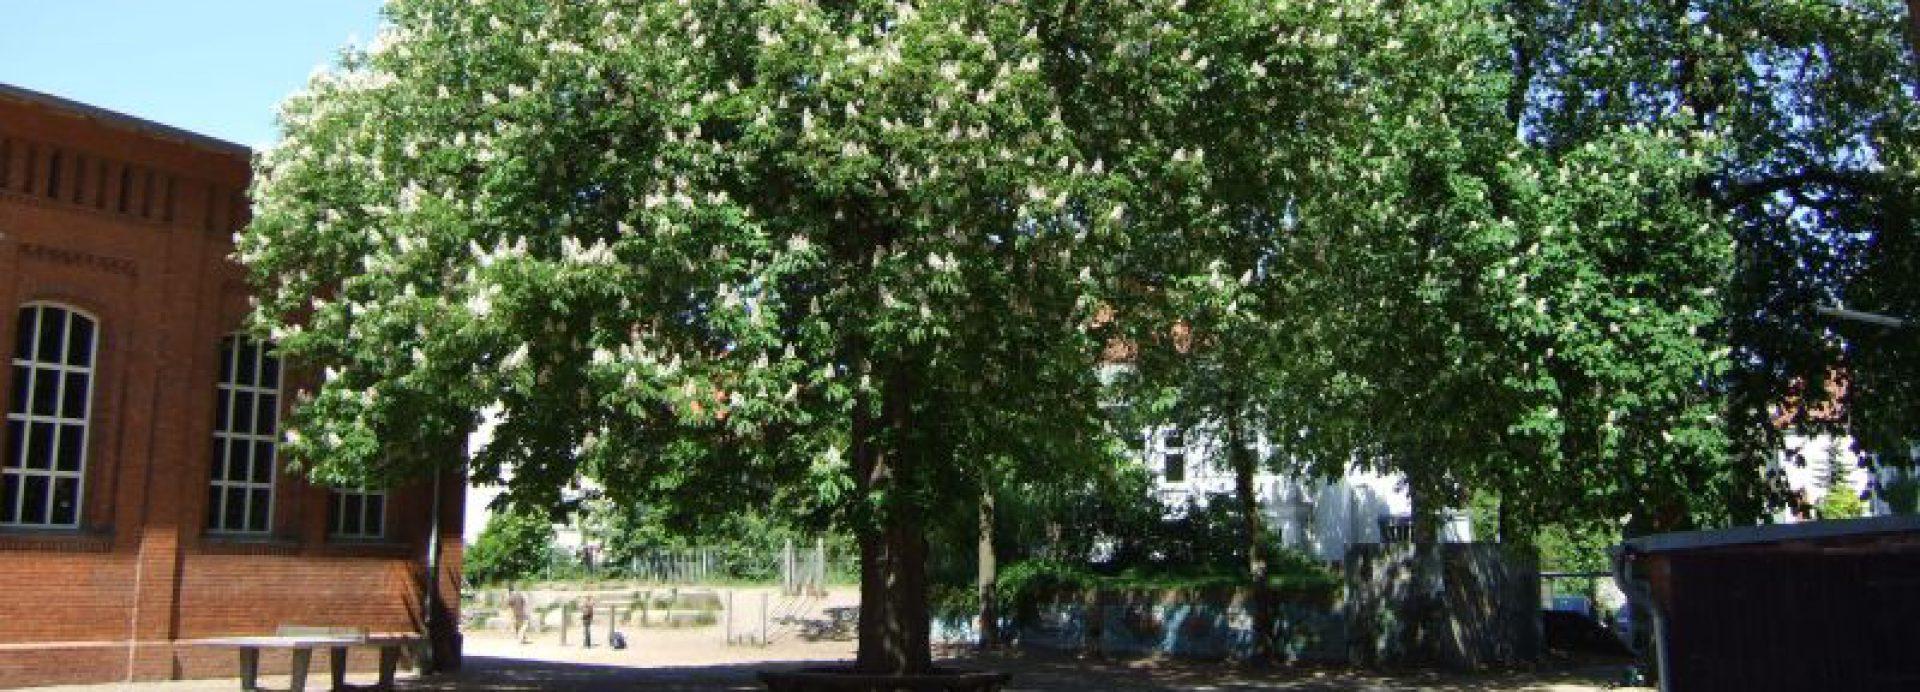 Bugenhagen Grundschule